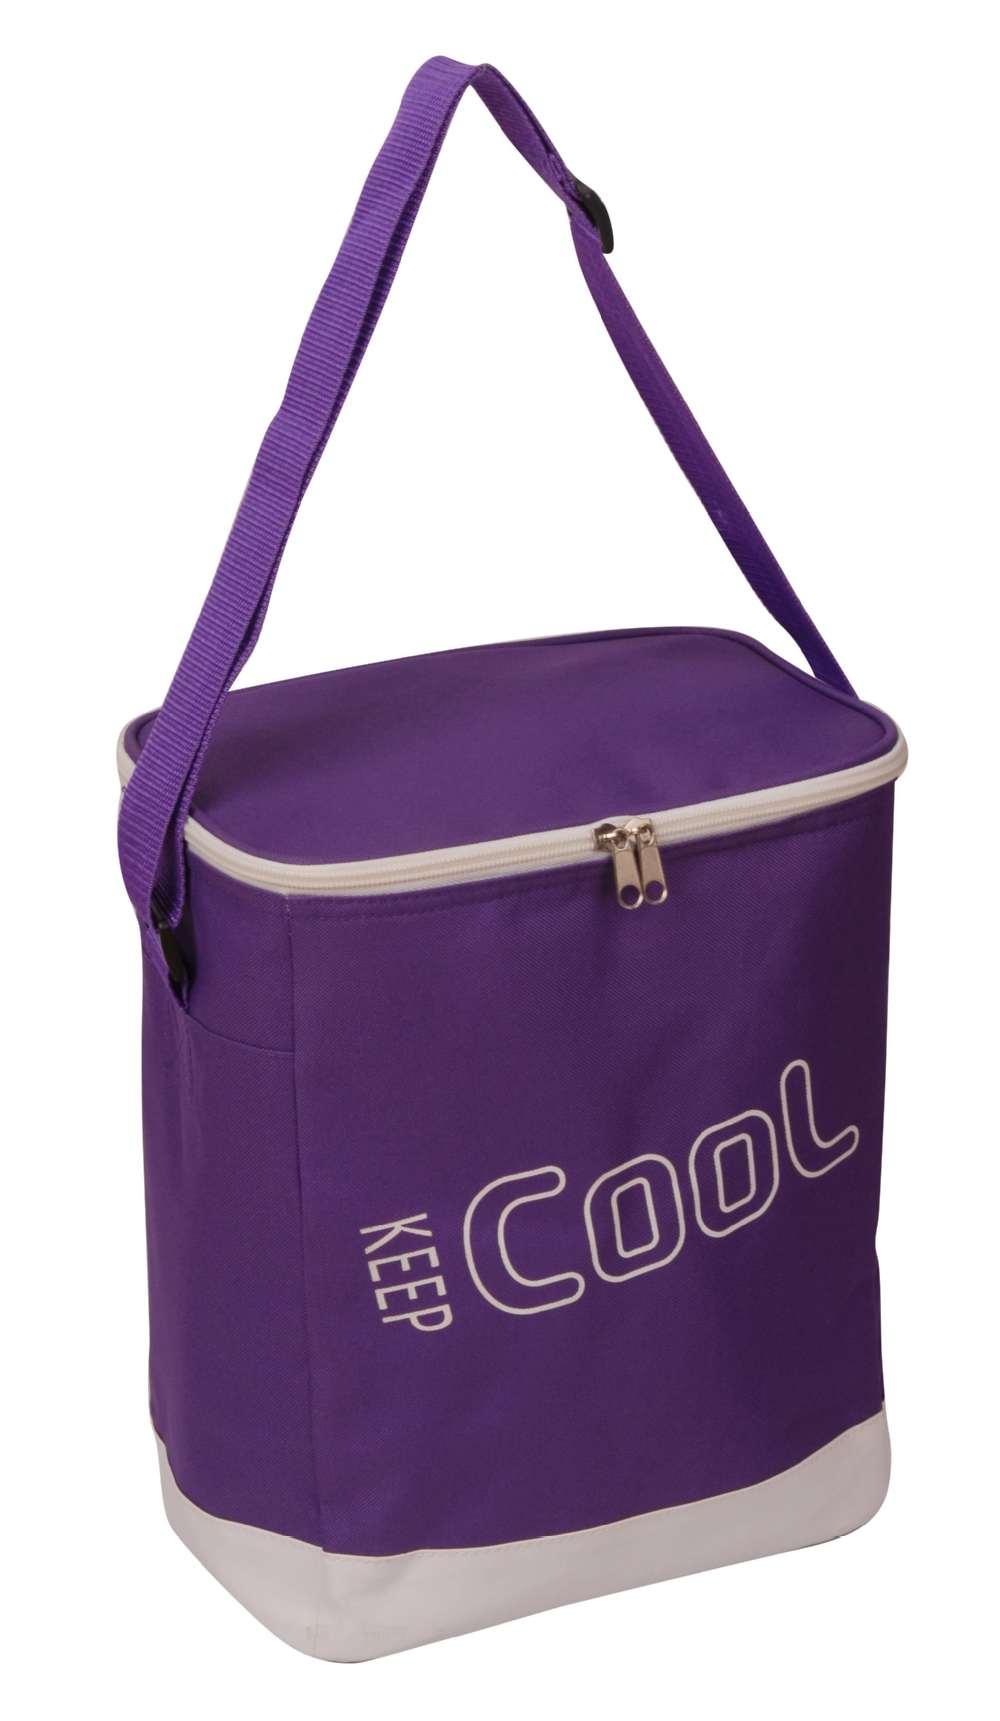 Champagne Fishing Backpack Style Cooler Bag Buy Backpack